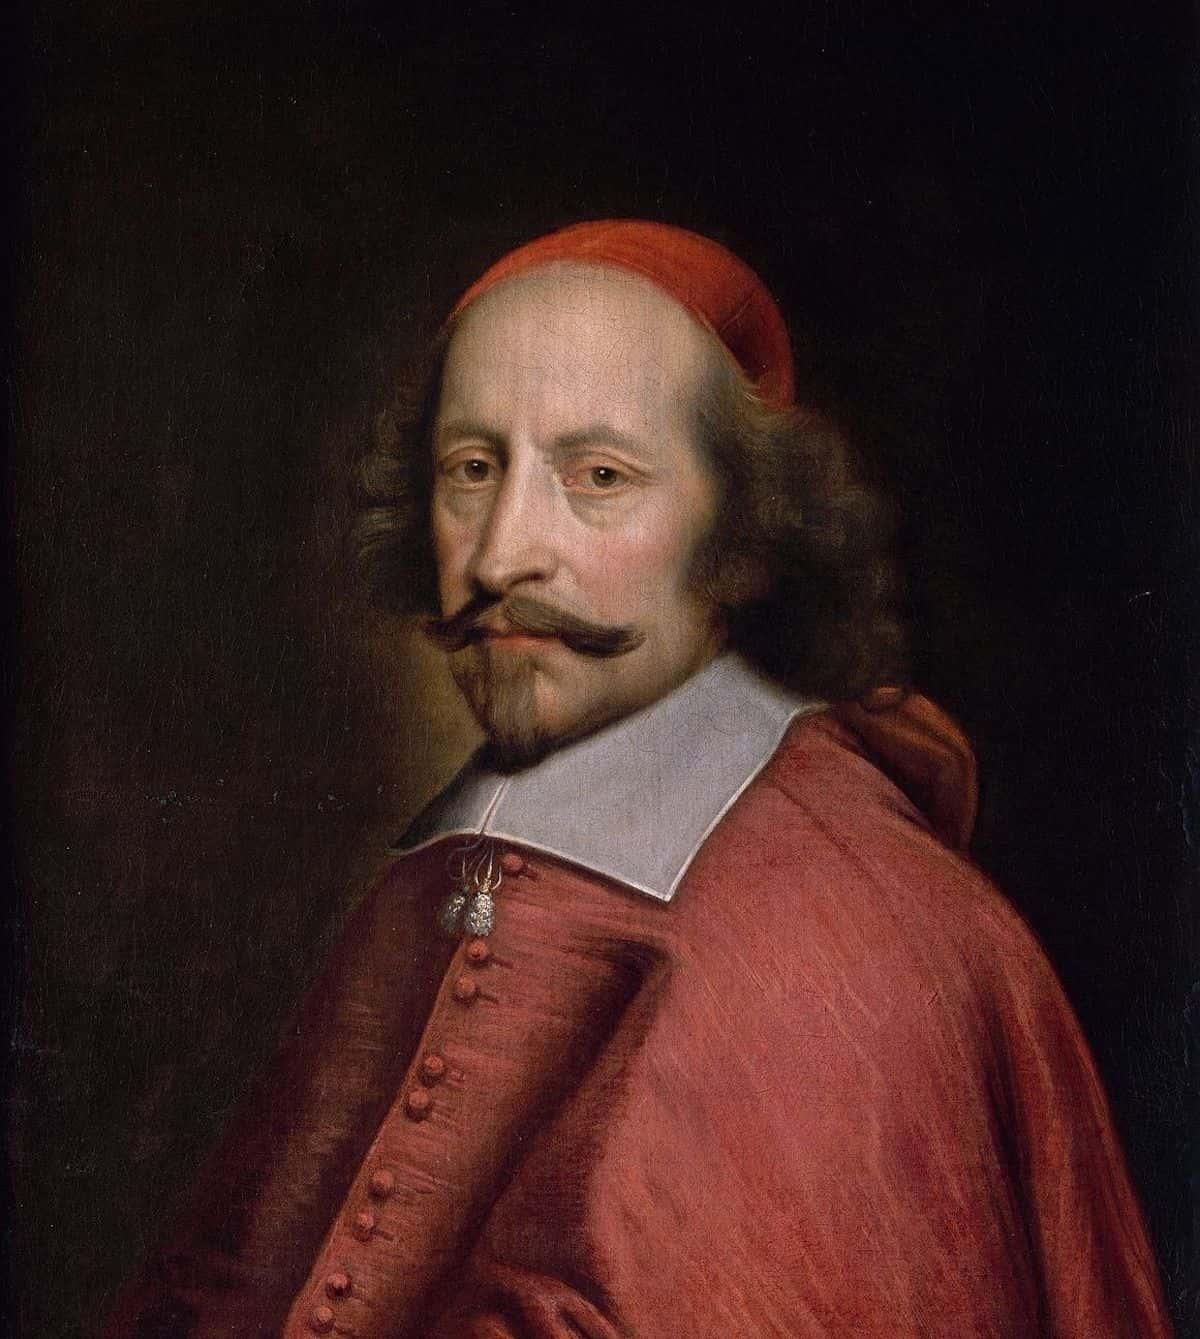 Cardinal Mazarin by Pierre Mignard (Musée Condé)